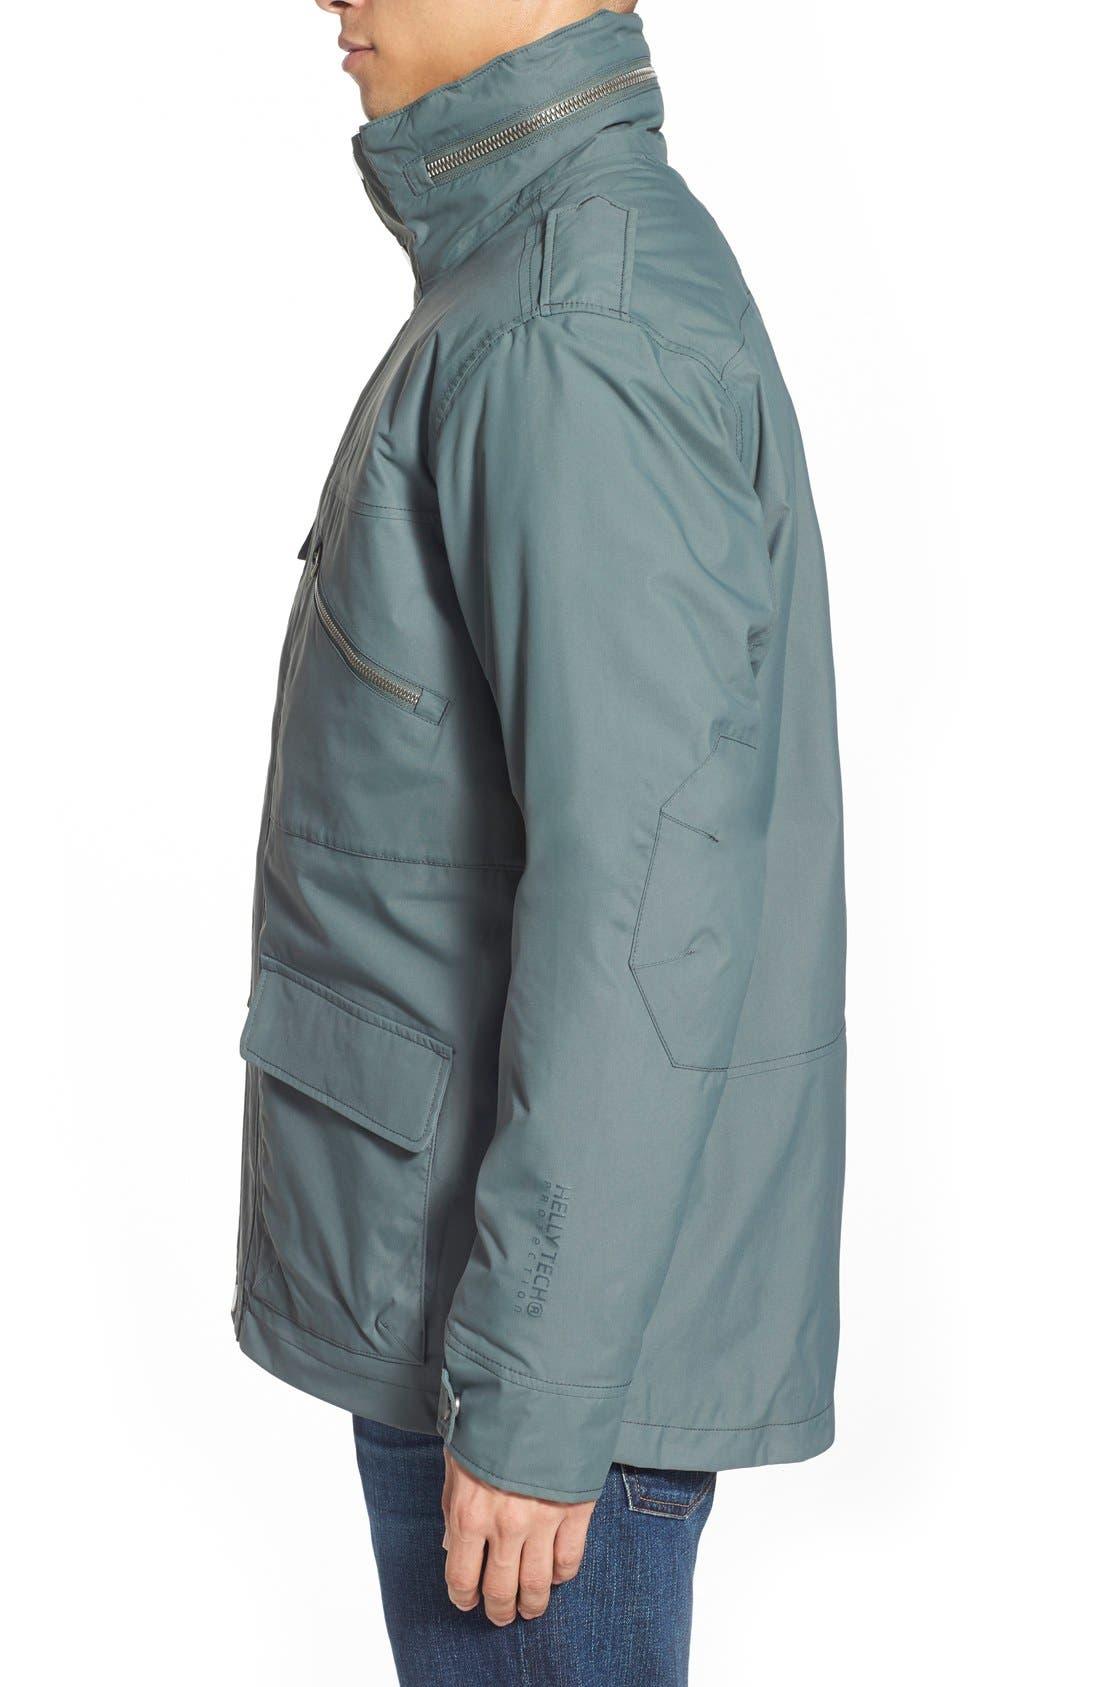 HellyHansen 'Universal' MotoRain Jacket,                             Alternate thumbnail 8, color,                             080